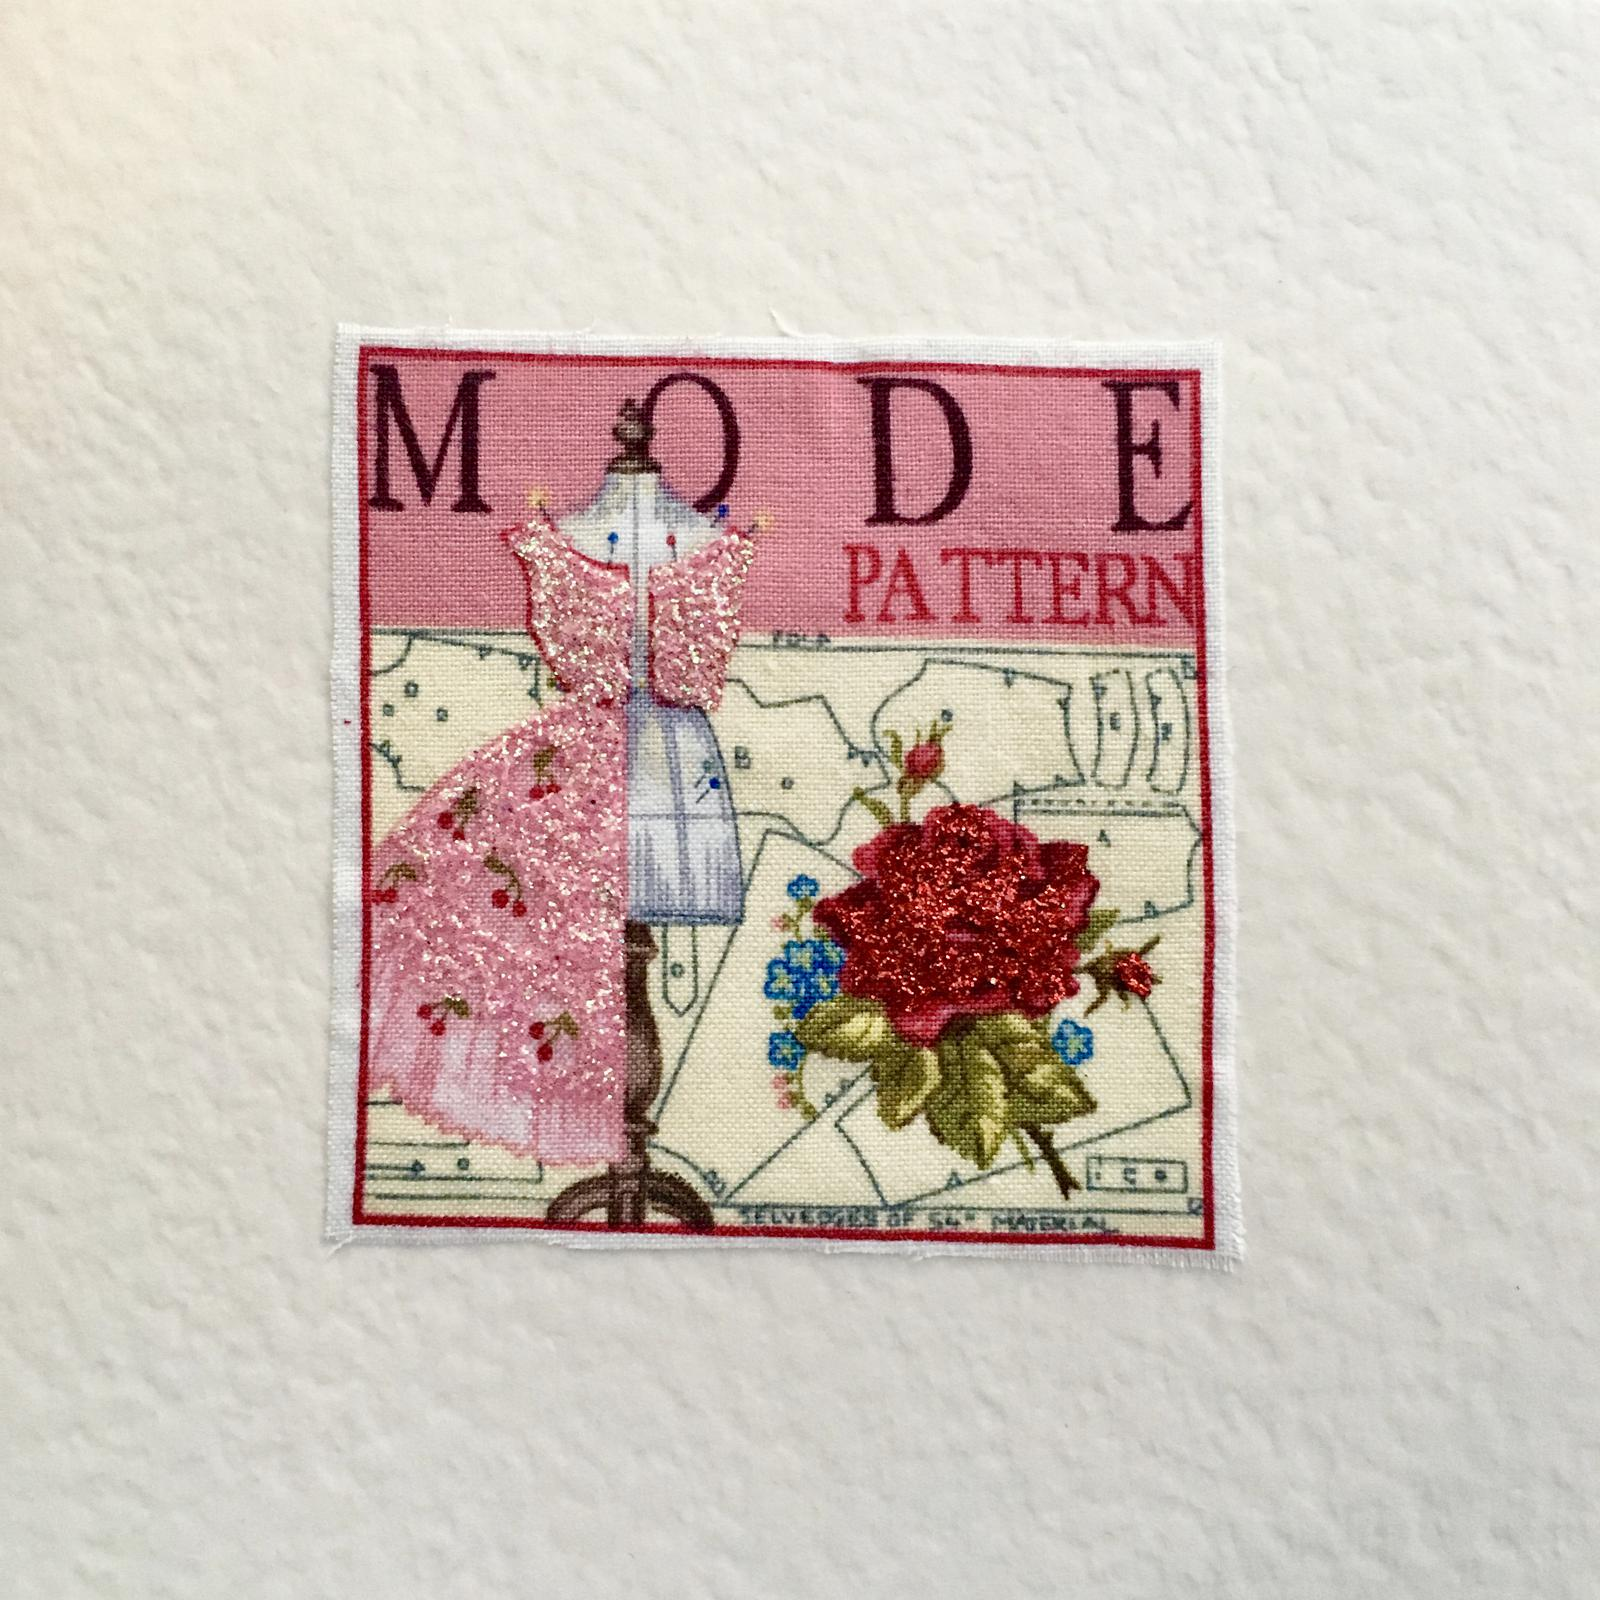 Handmade fabric and glitter cards